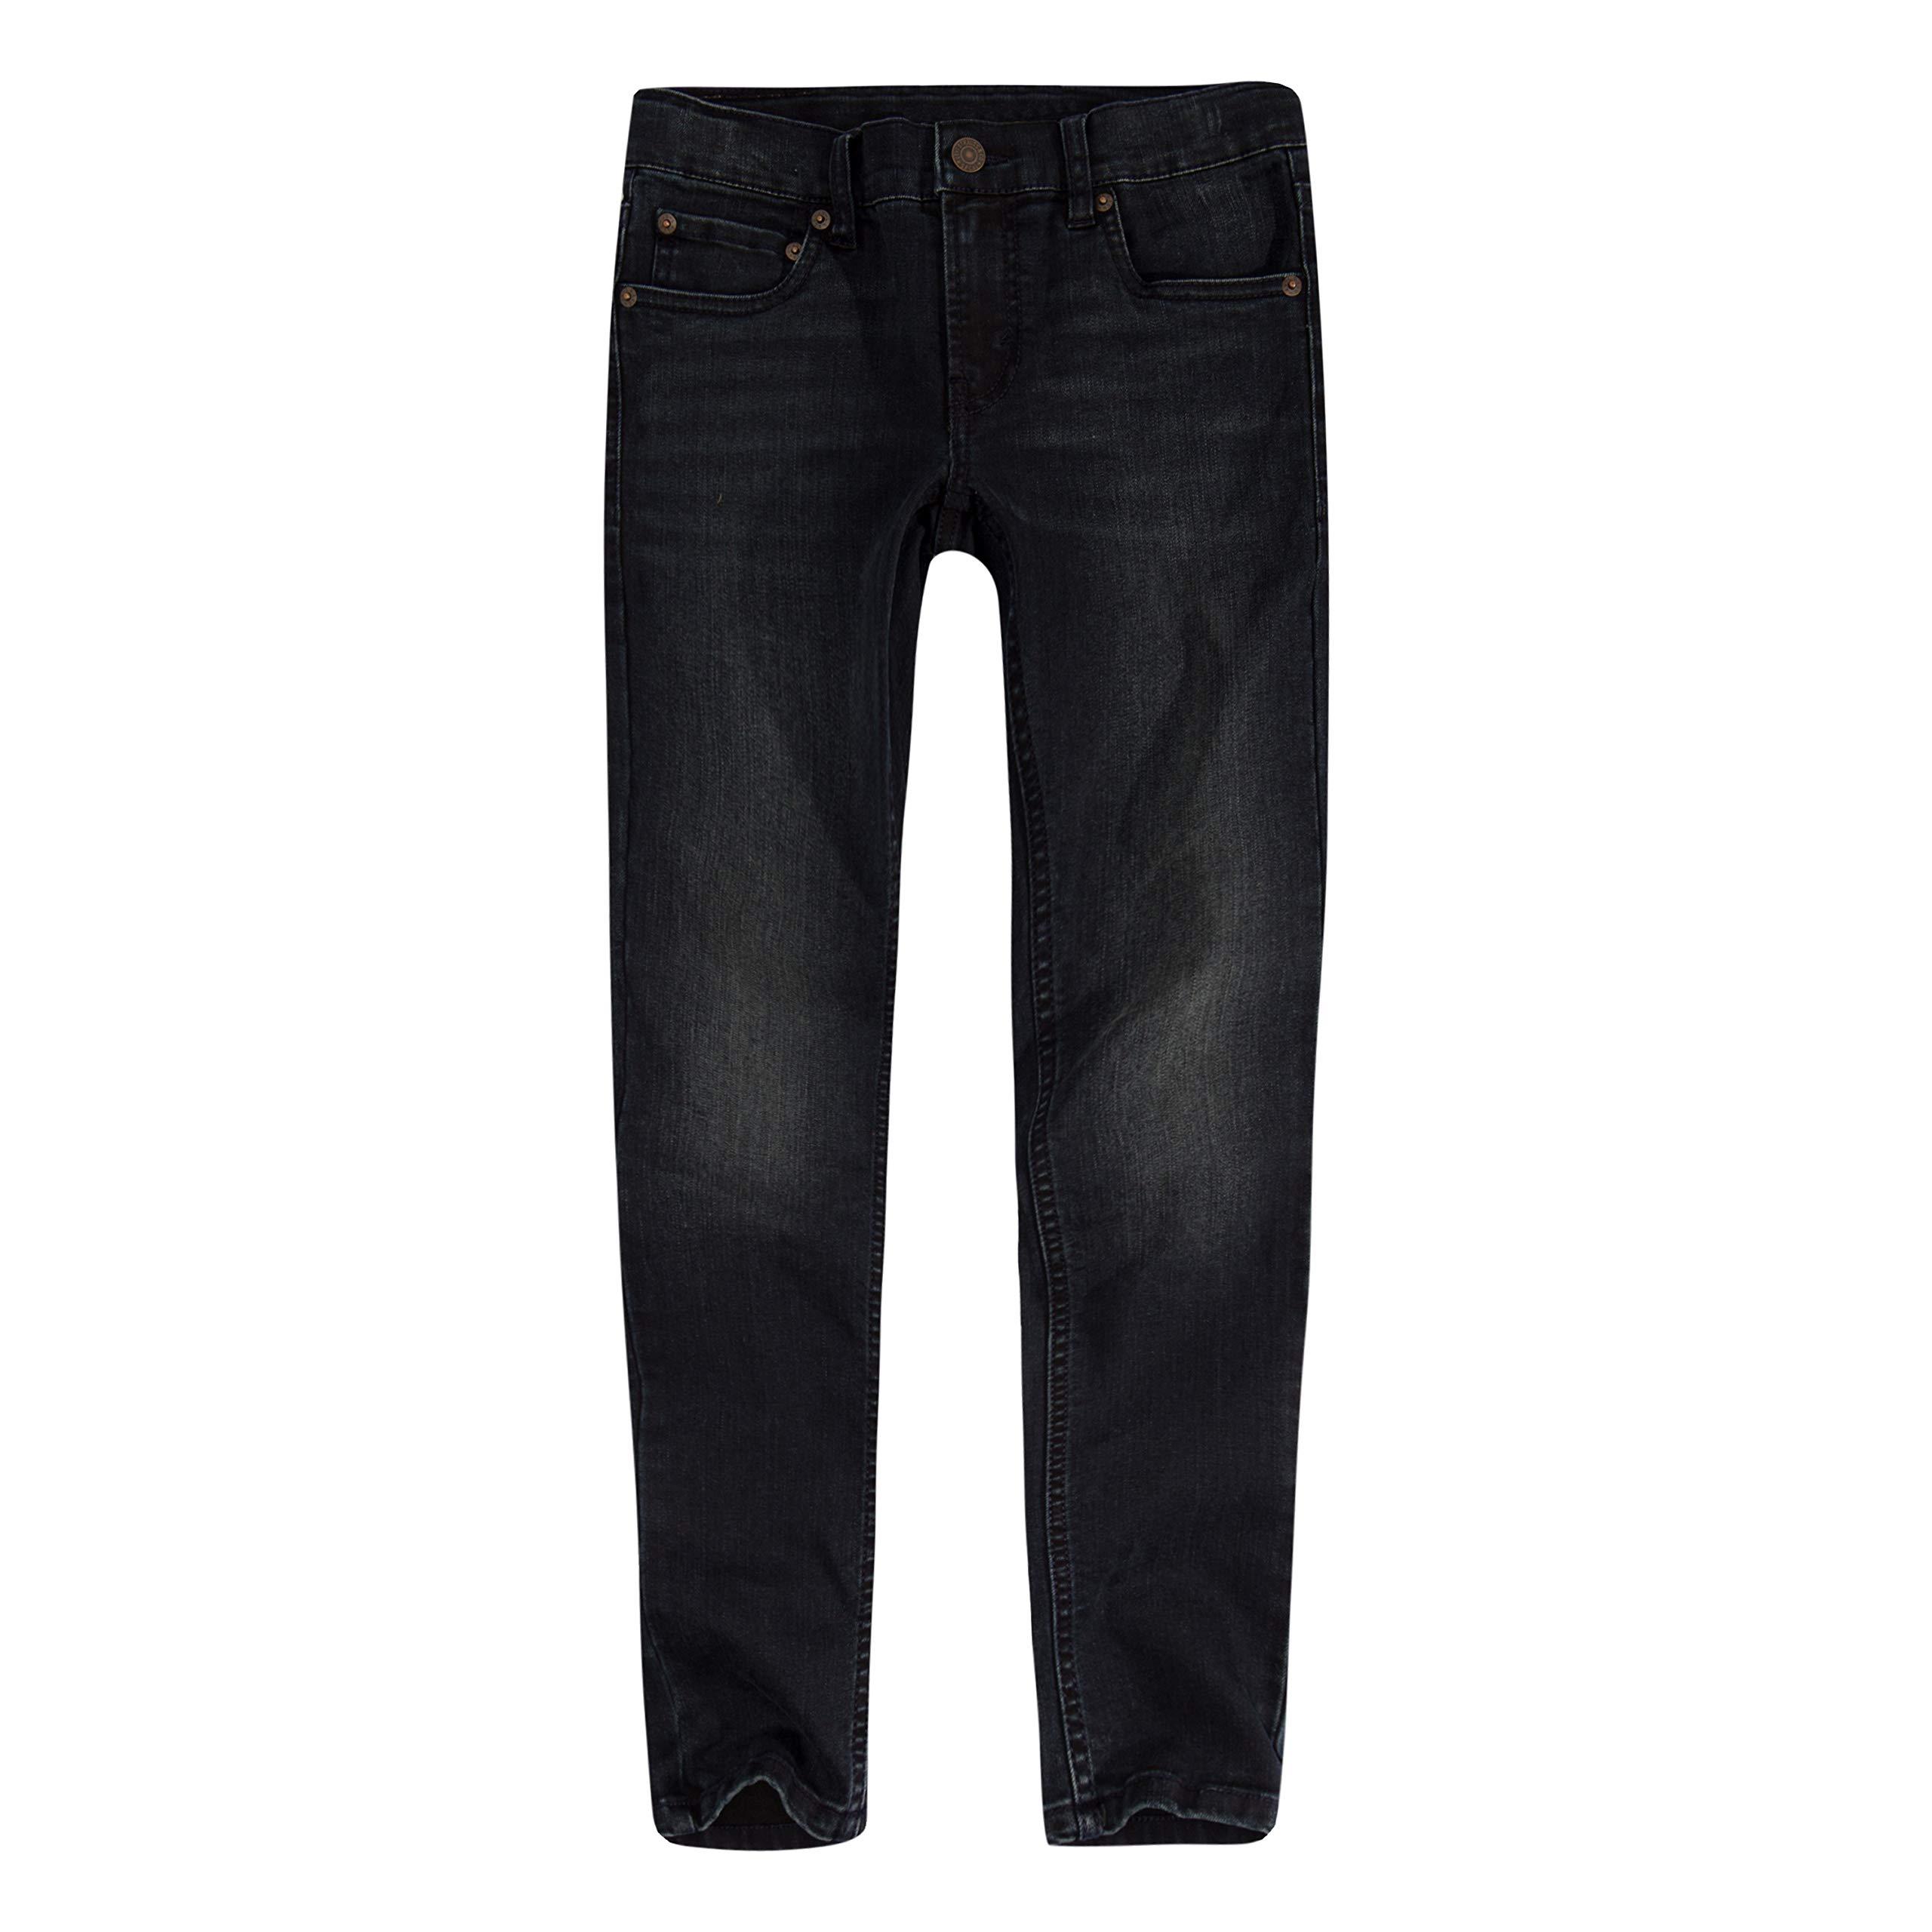 Levi's Boys' Big 519 Extreme Skinny Fit Jeans, Nightswatch, 18